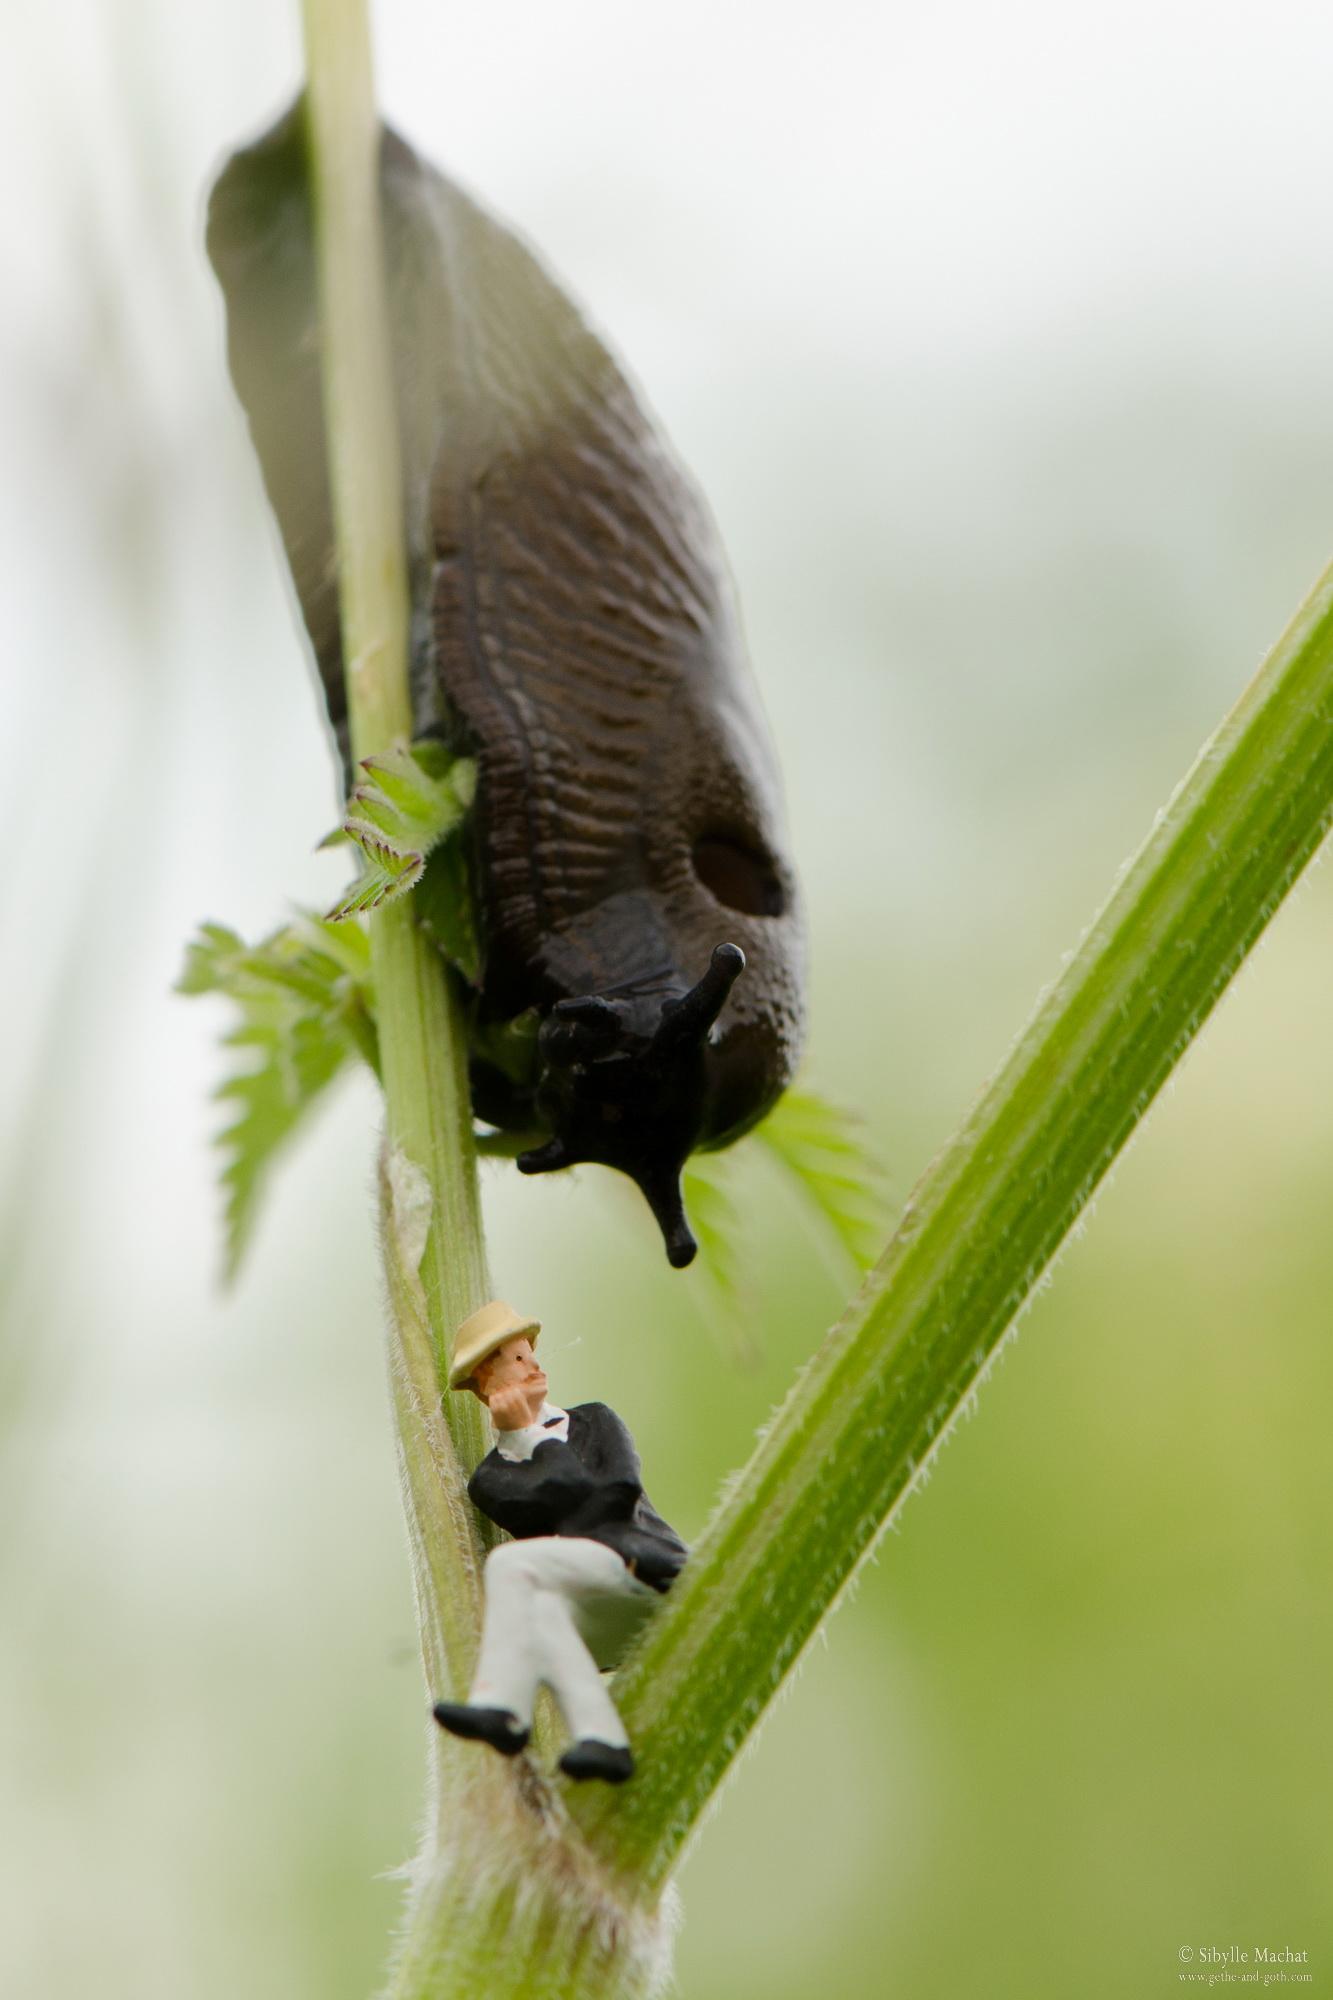 The Slug is Coming for You